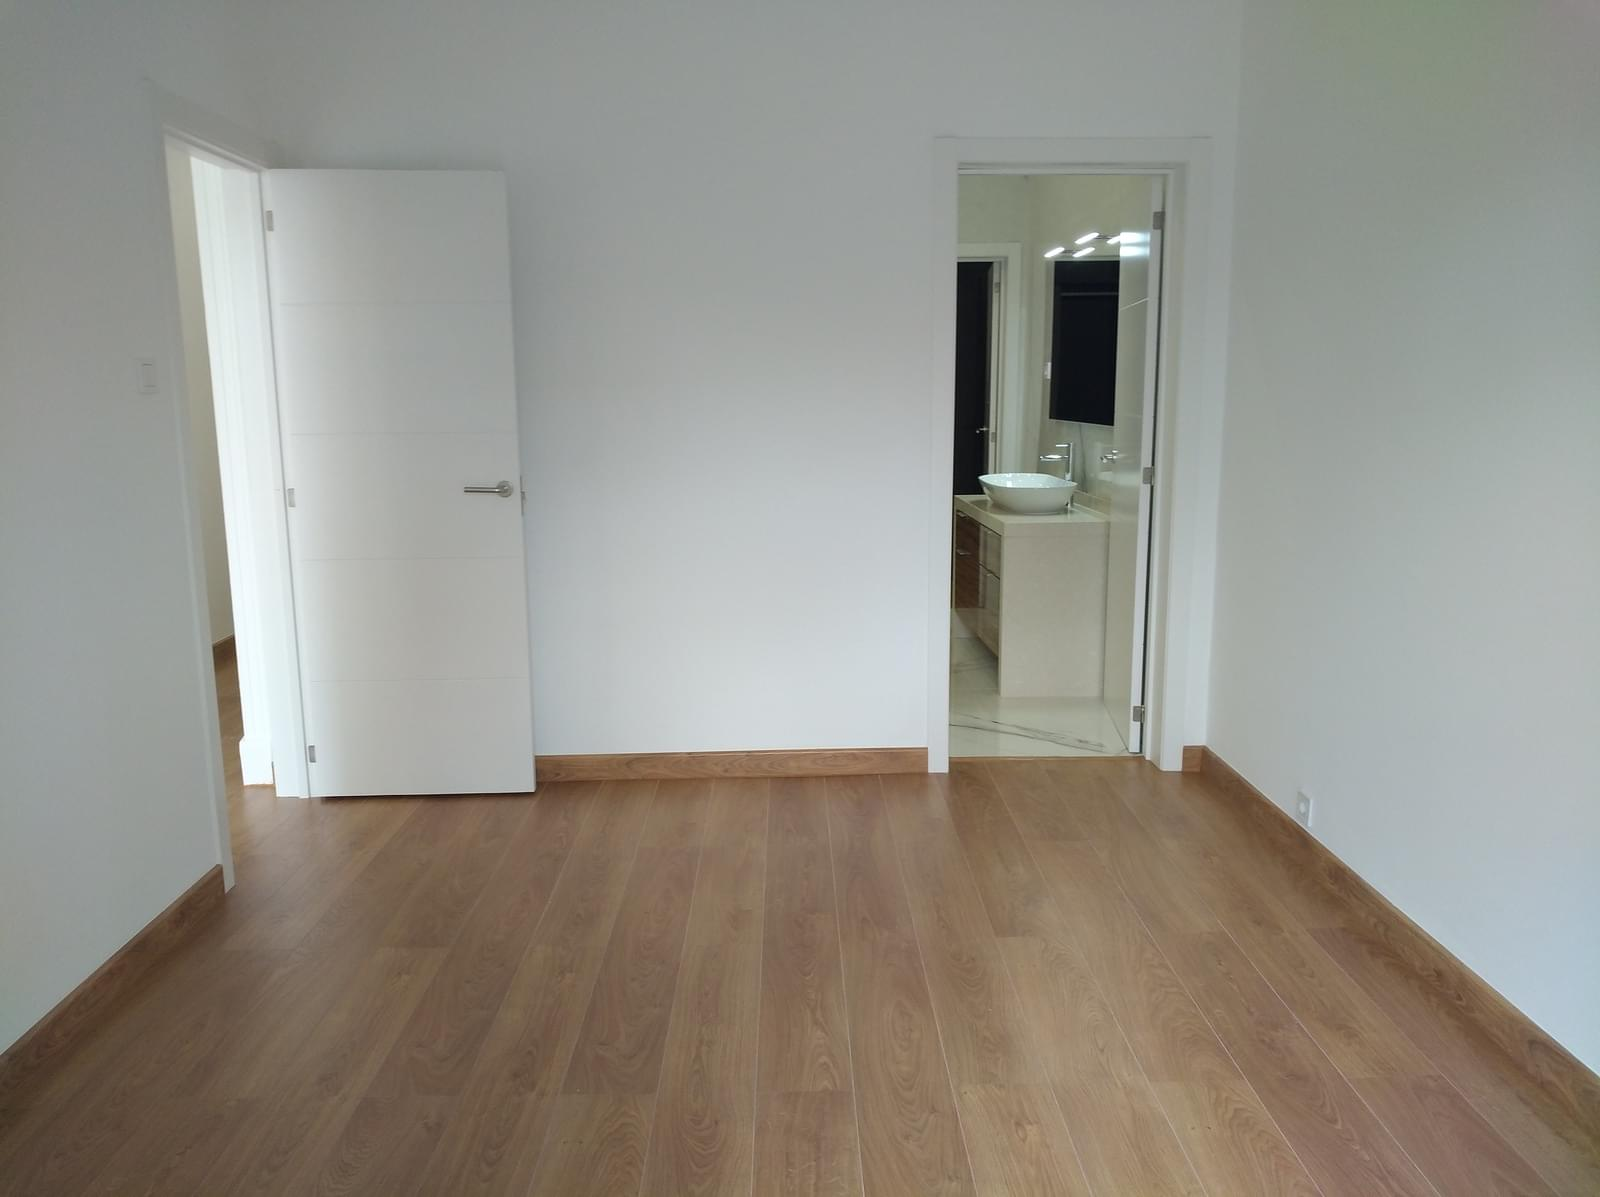 pf17316-apartamento-t2-lisboa-830a776e-cb8b-48e4-b35f-ad63a5d216ed